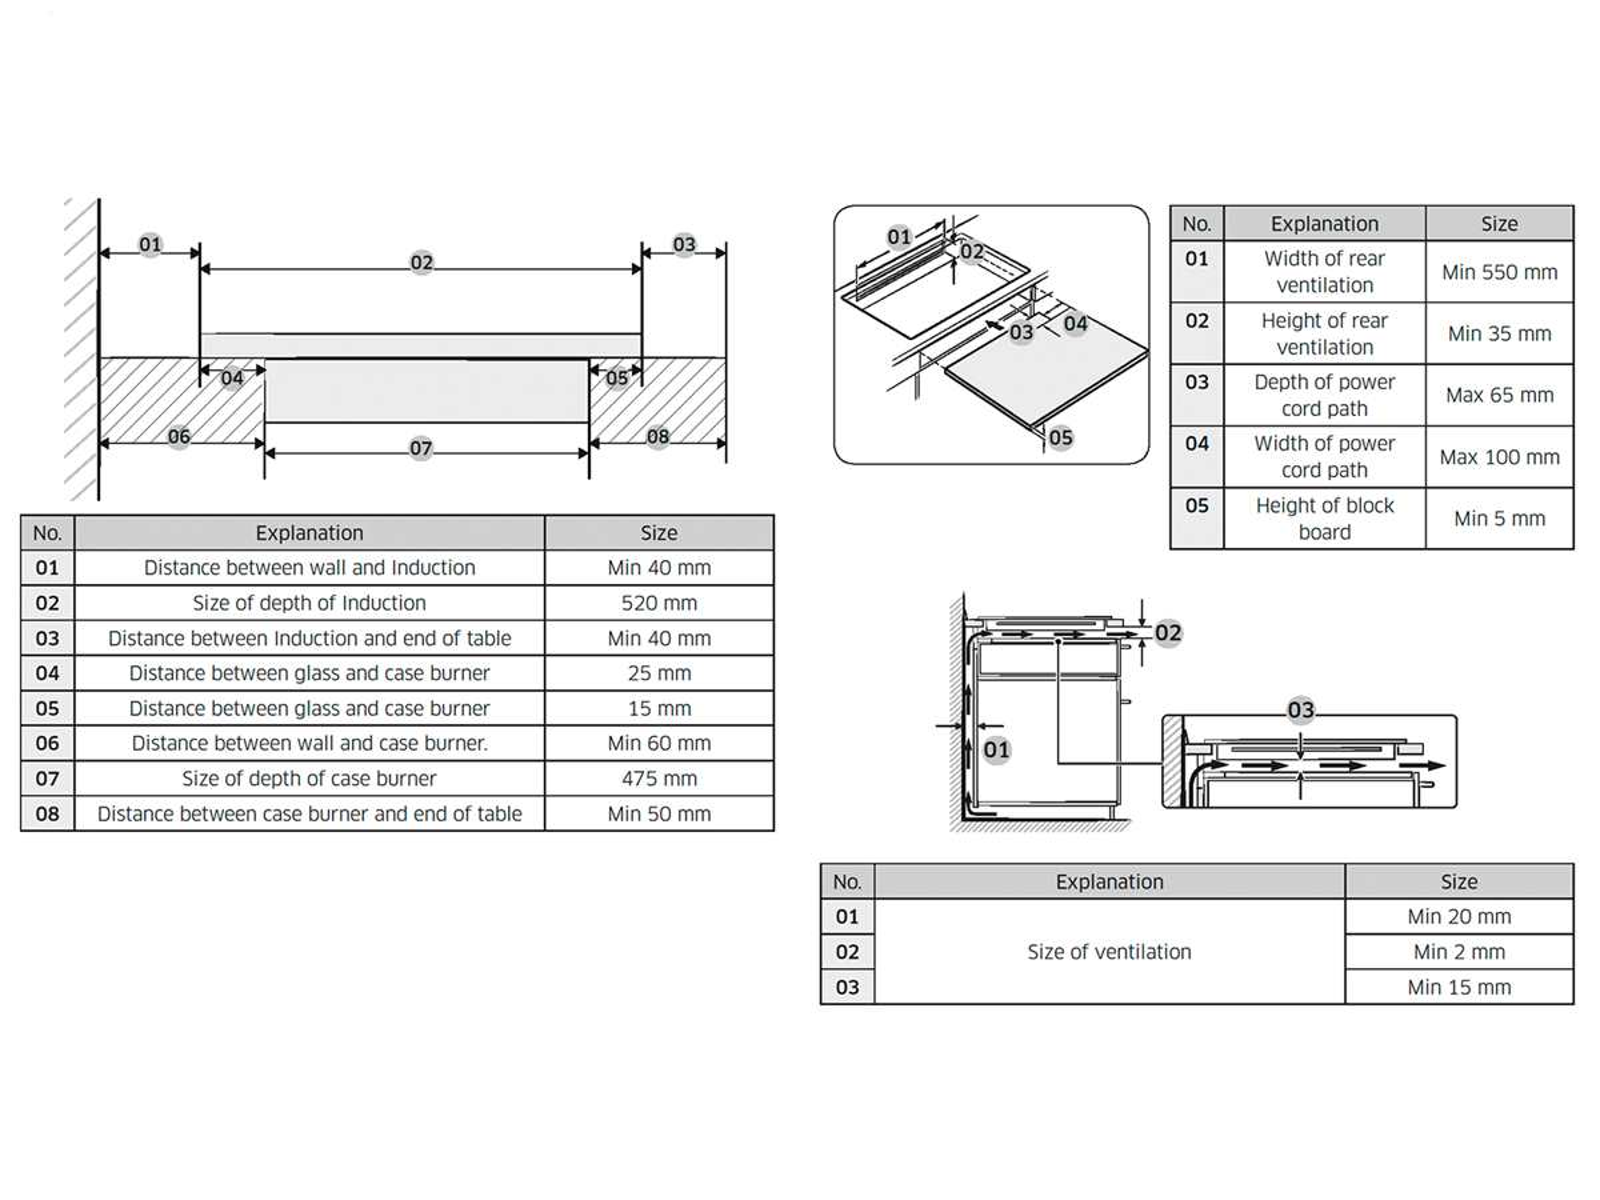 Samsung NZ64T9787TK/EG Induktionskochfeld autark